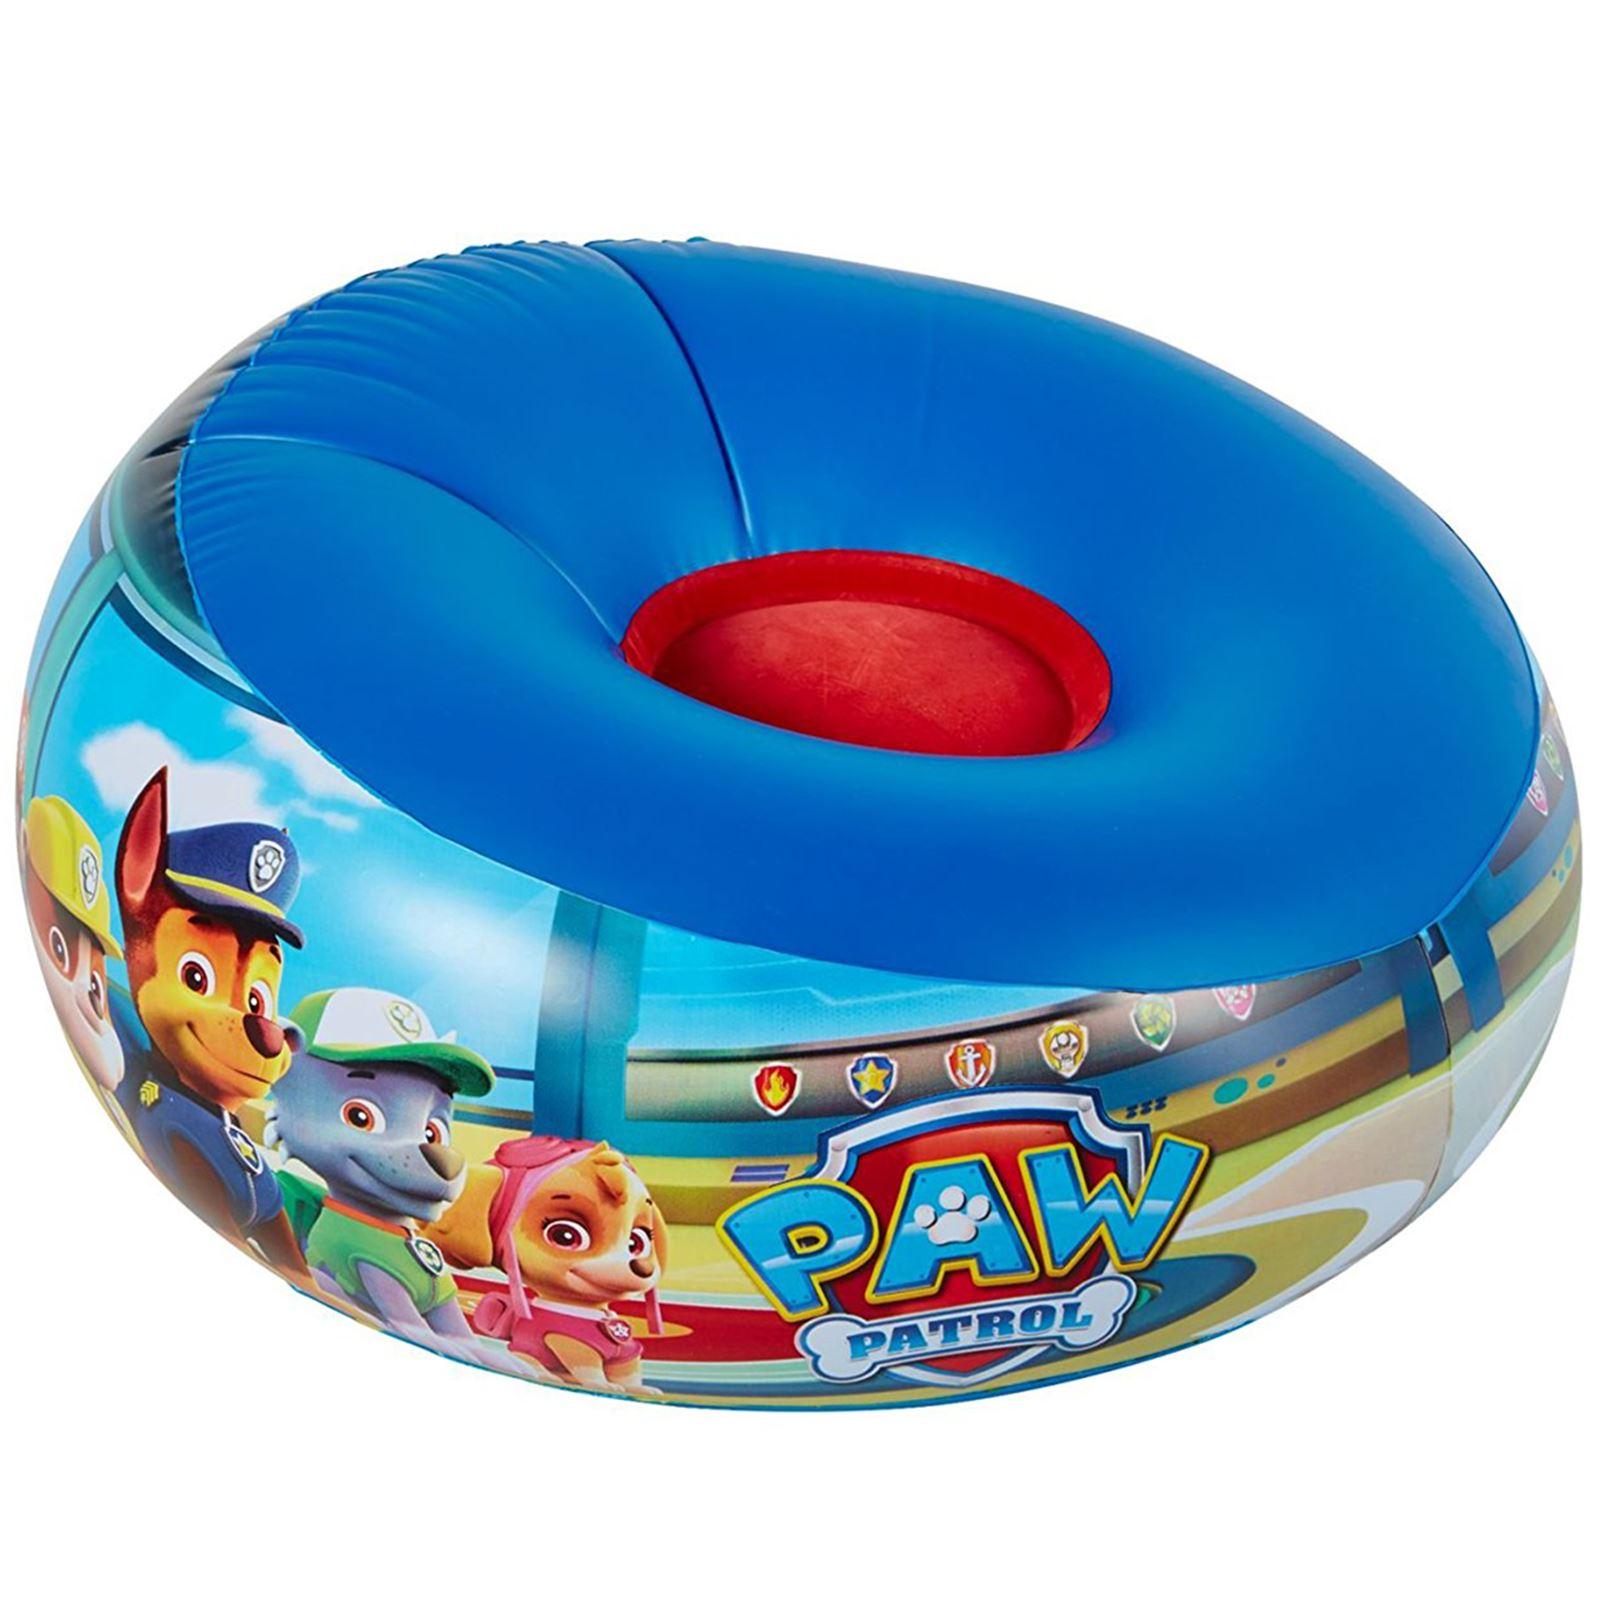 star wars bean bag chair best living room chairs kids junior lightweight inflatable paw patrol my